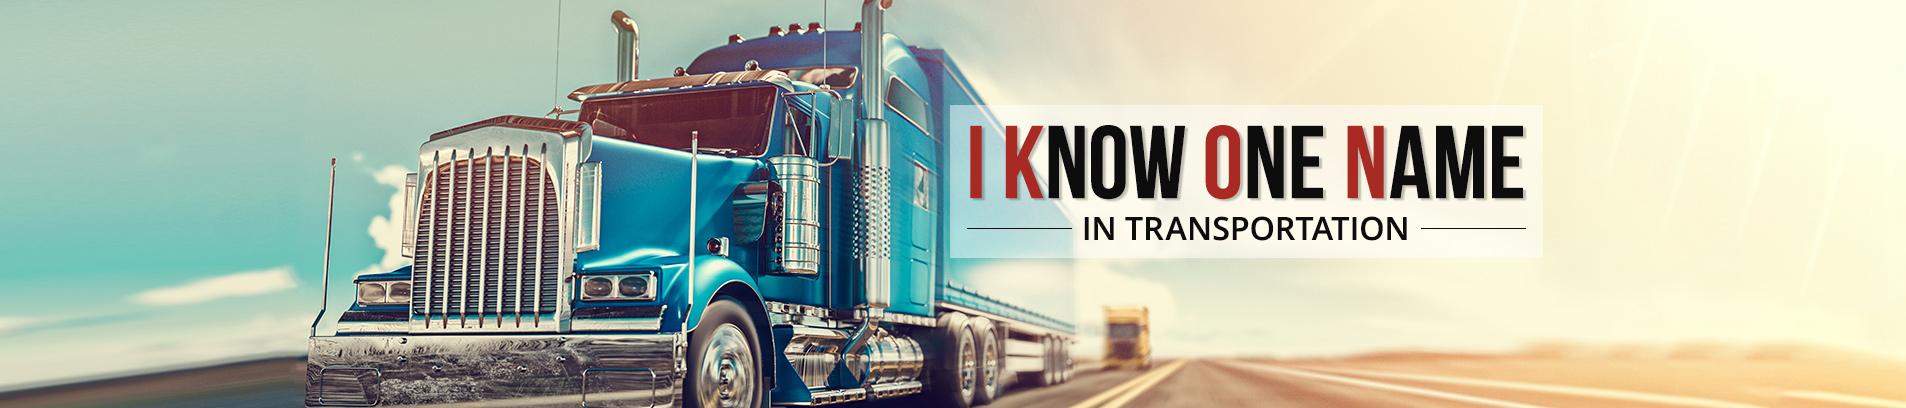 IKON Transportation Services